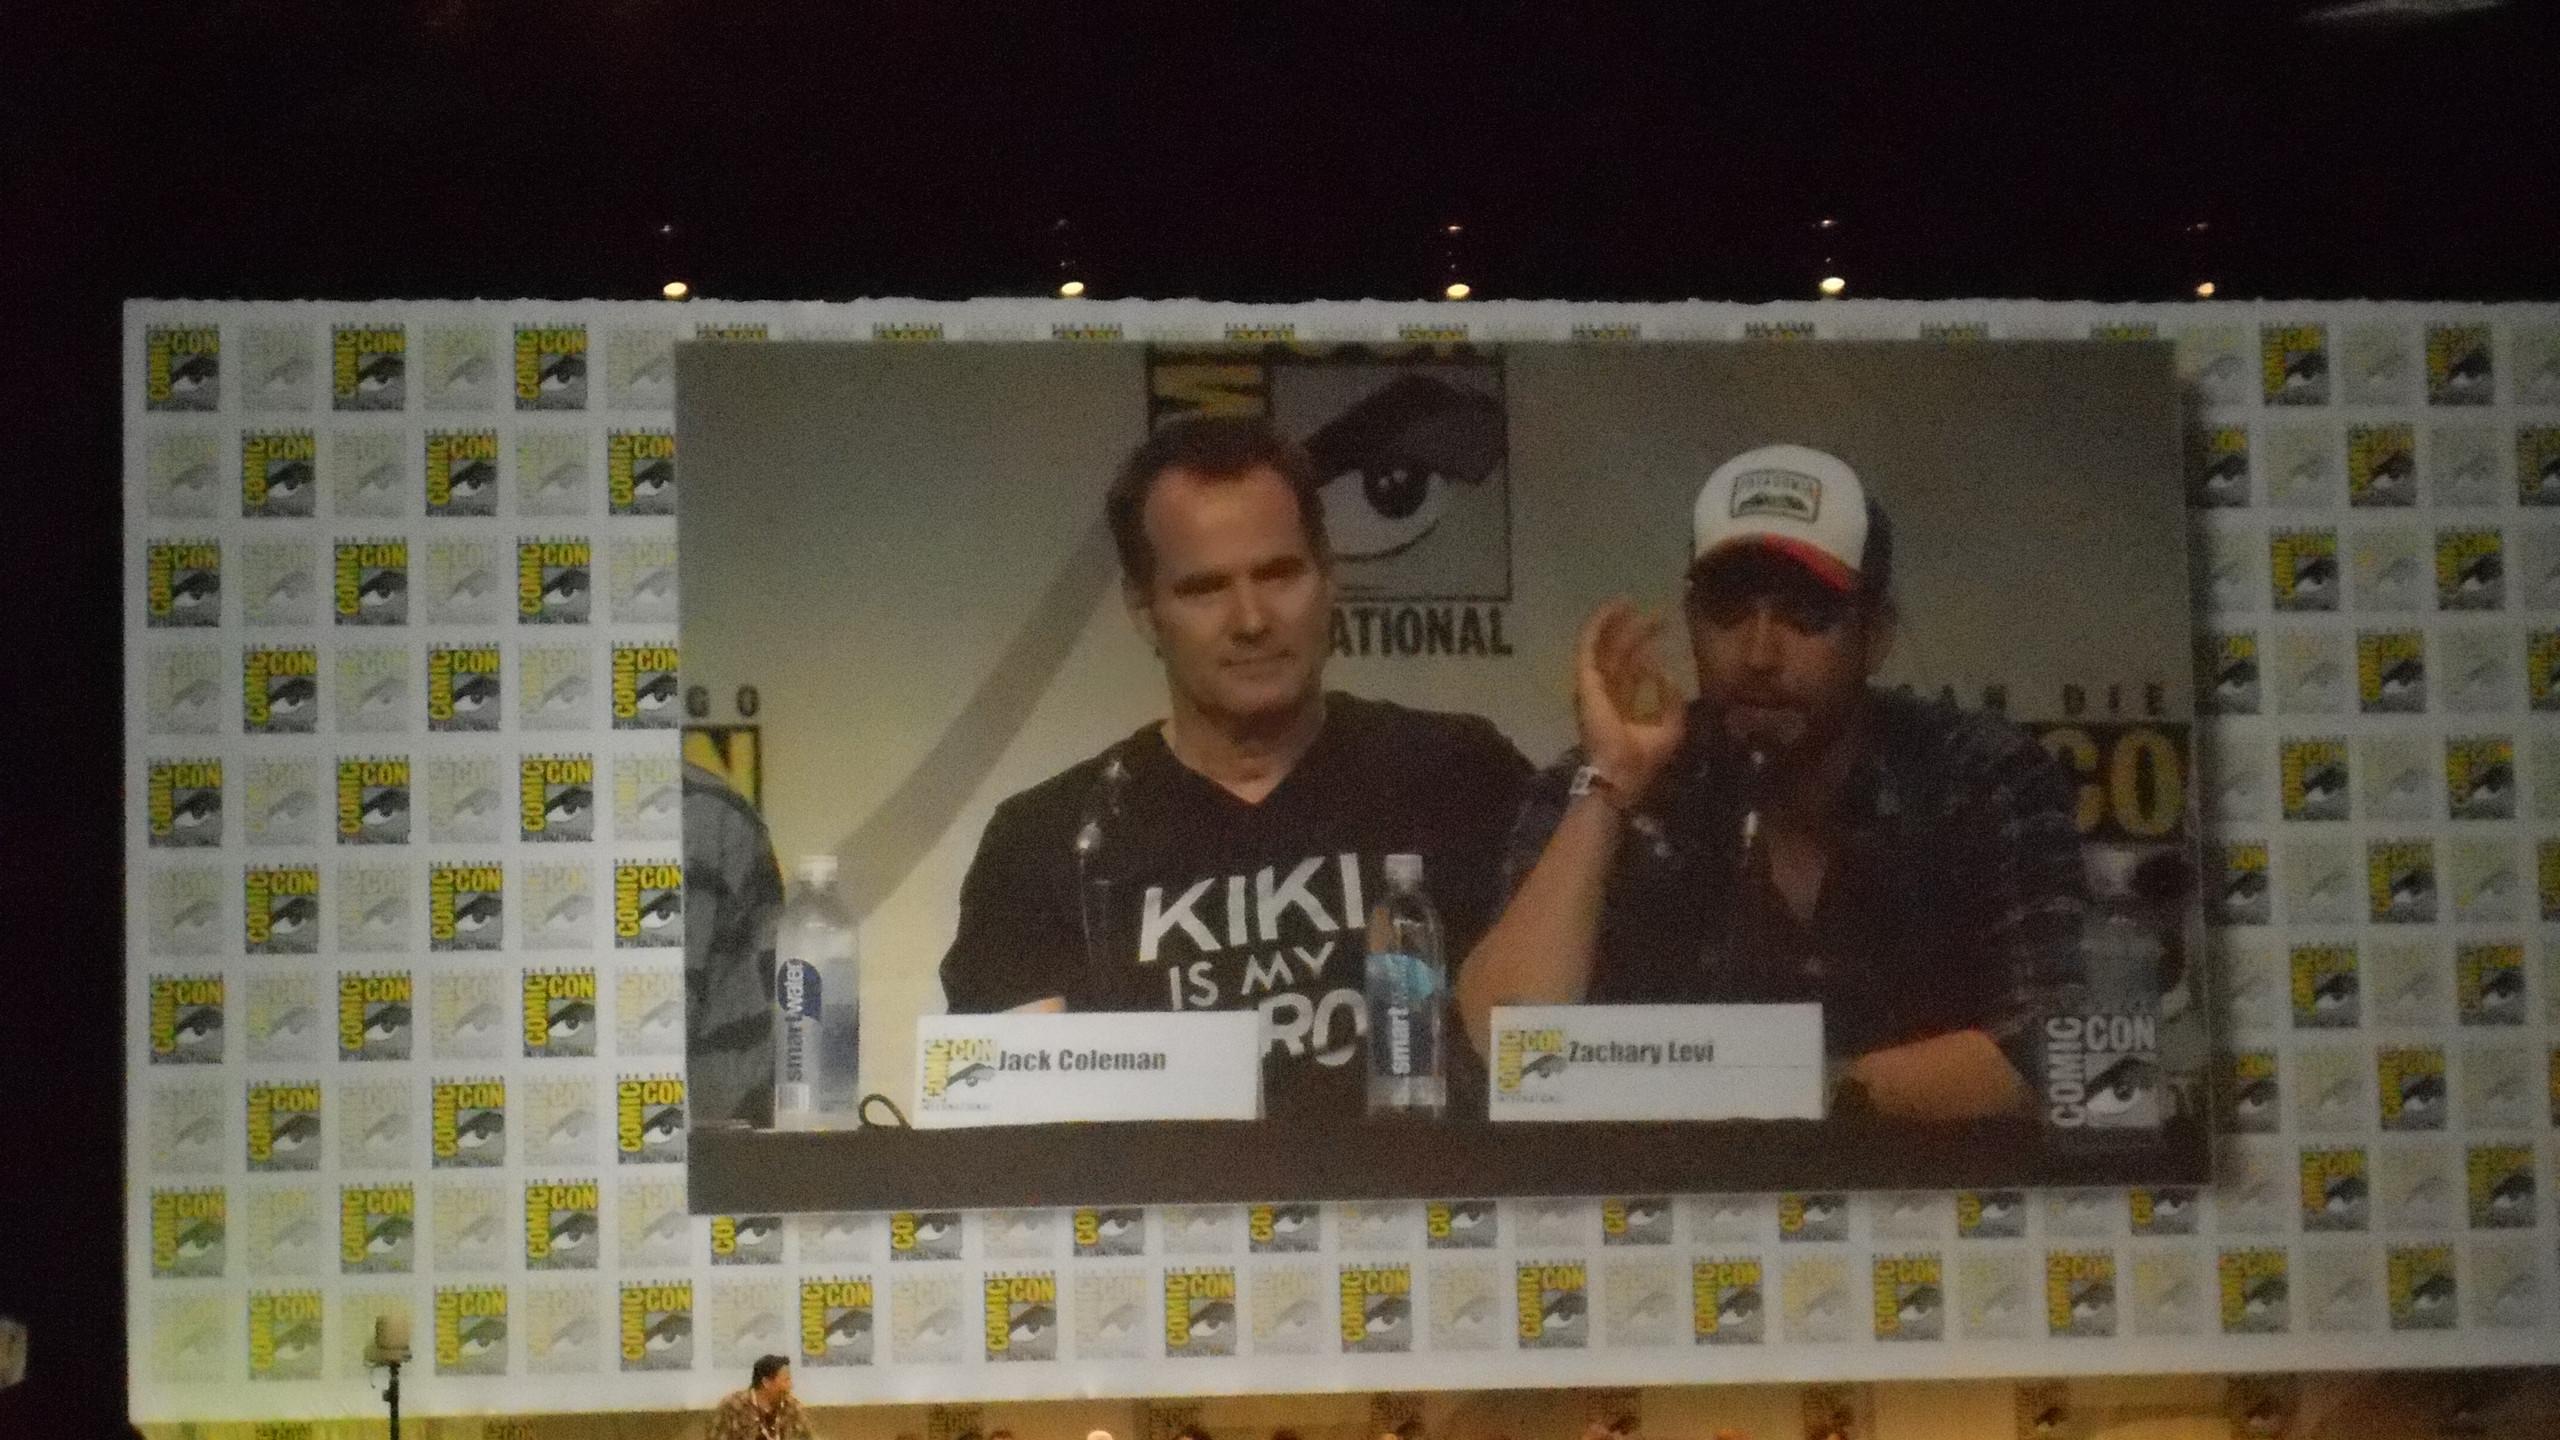 San Diego, Comic-Con, convention, SDCC, Zachary Levi